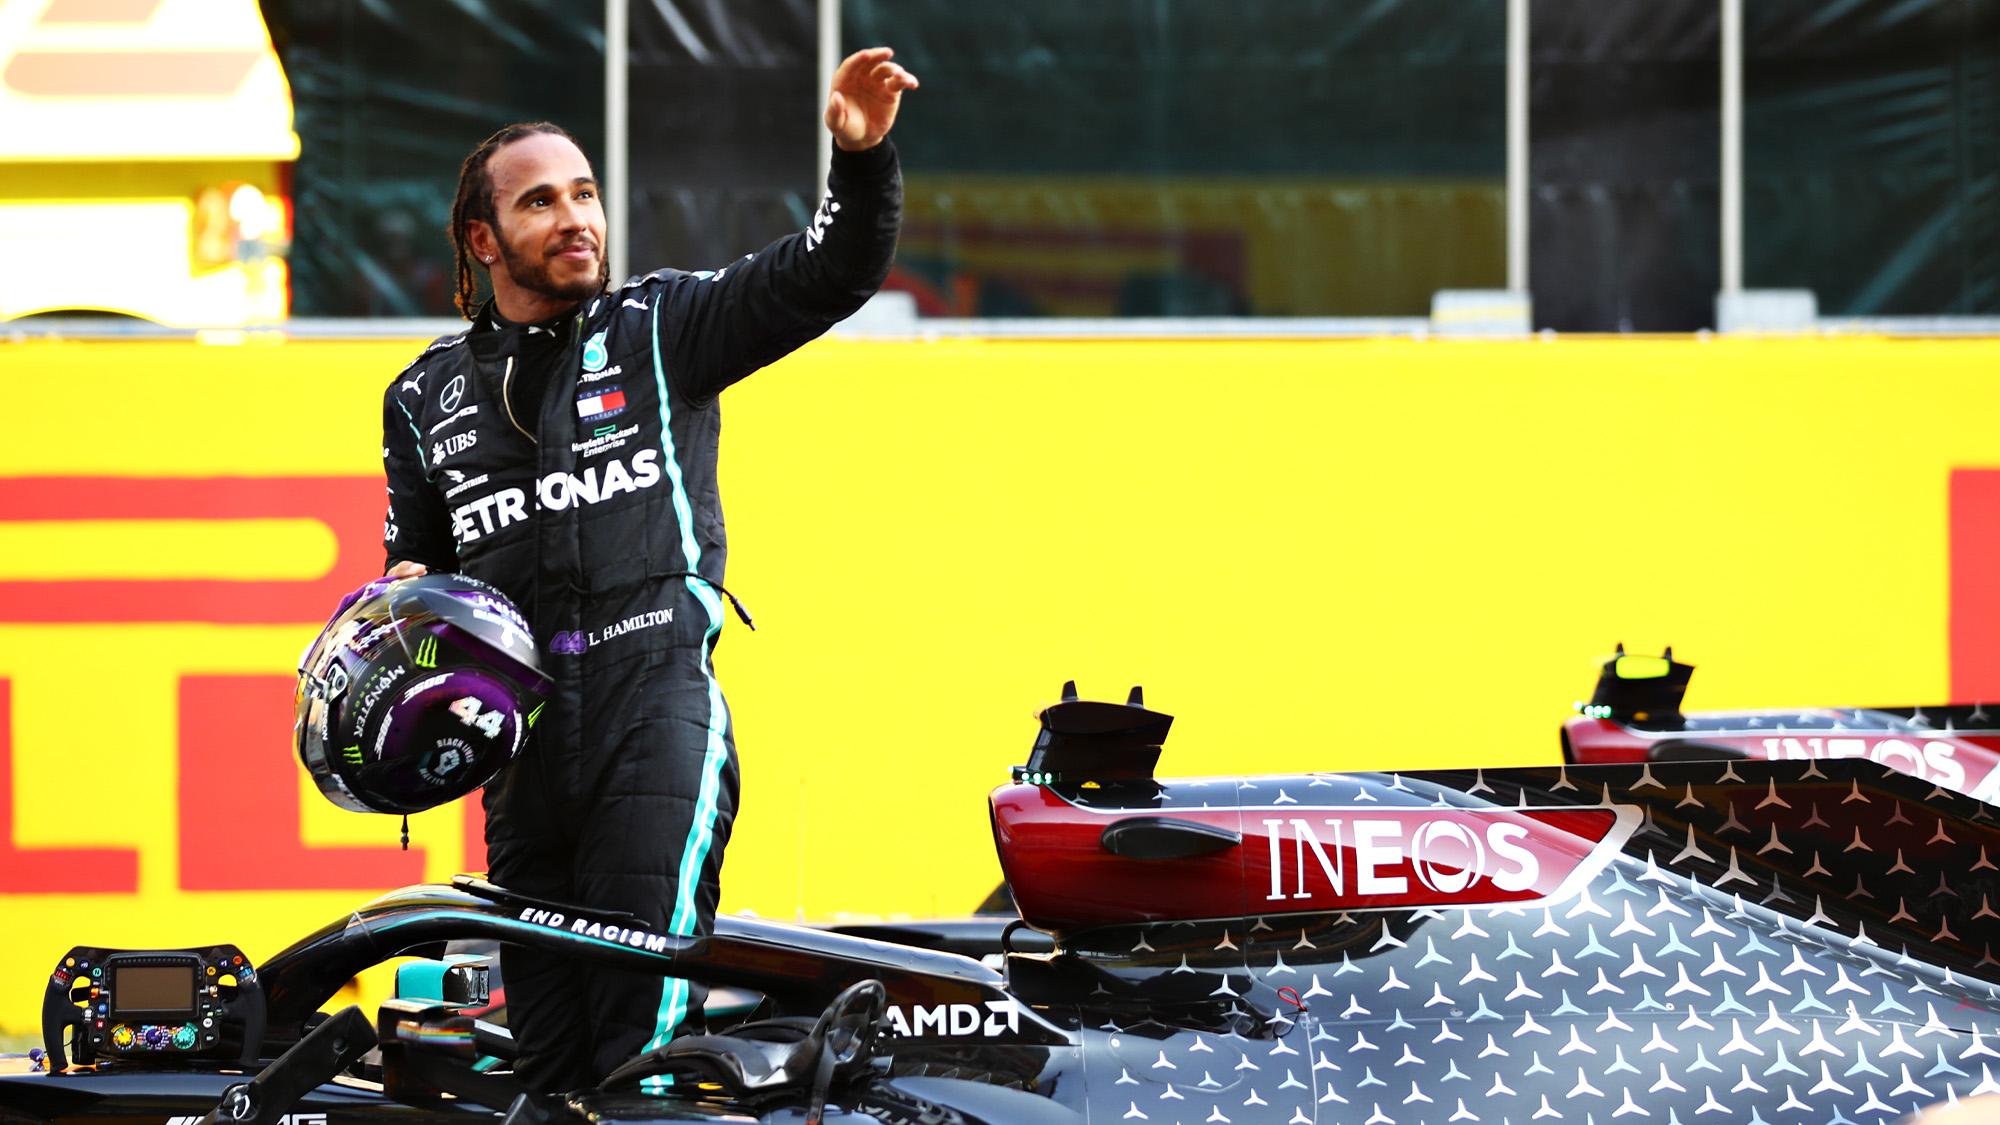 Lewis Hamilton raises his arm after winning the 2020 Tuscan Grand Prix at Mugello